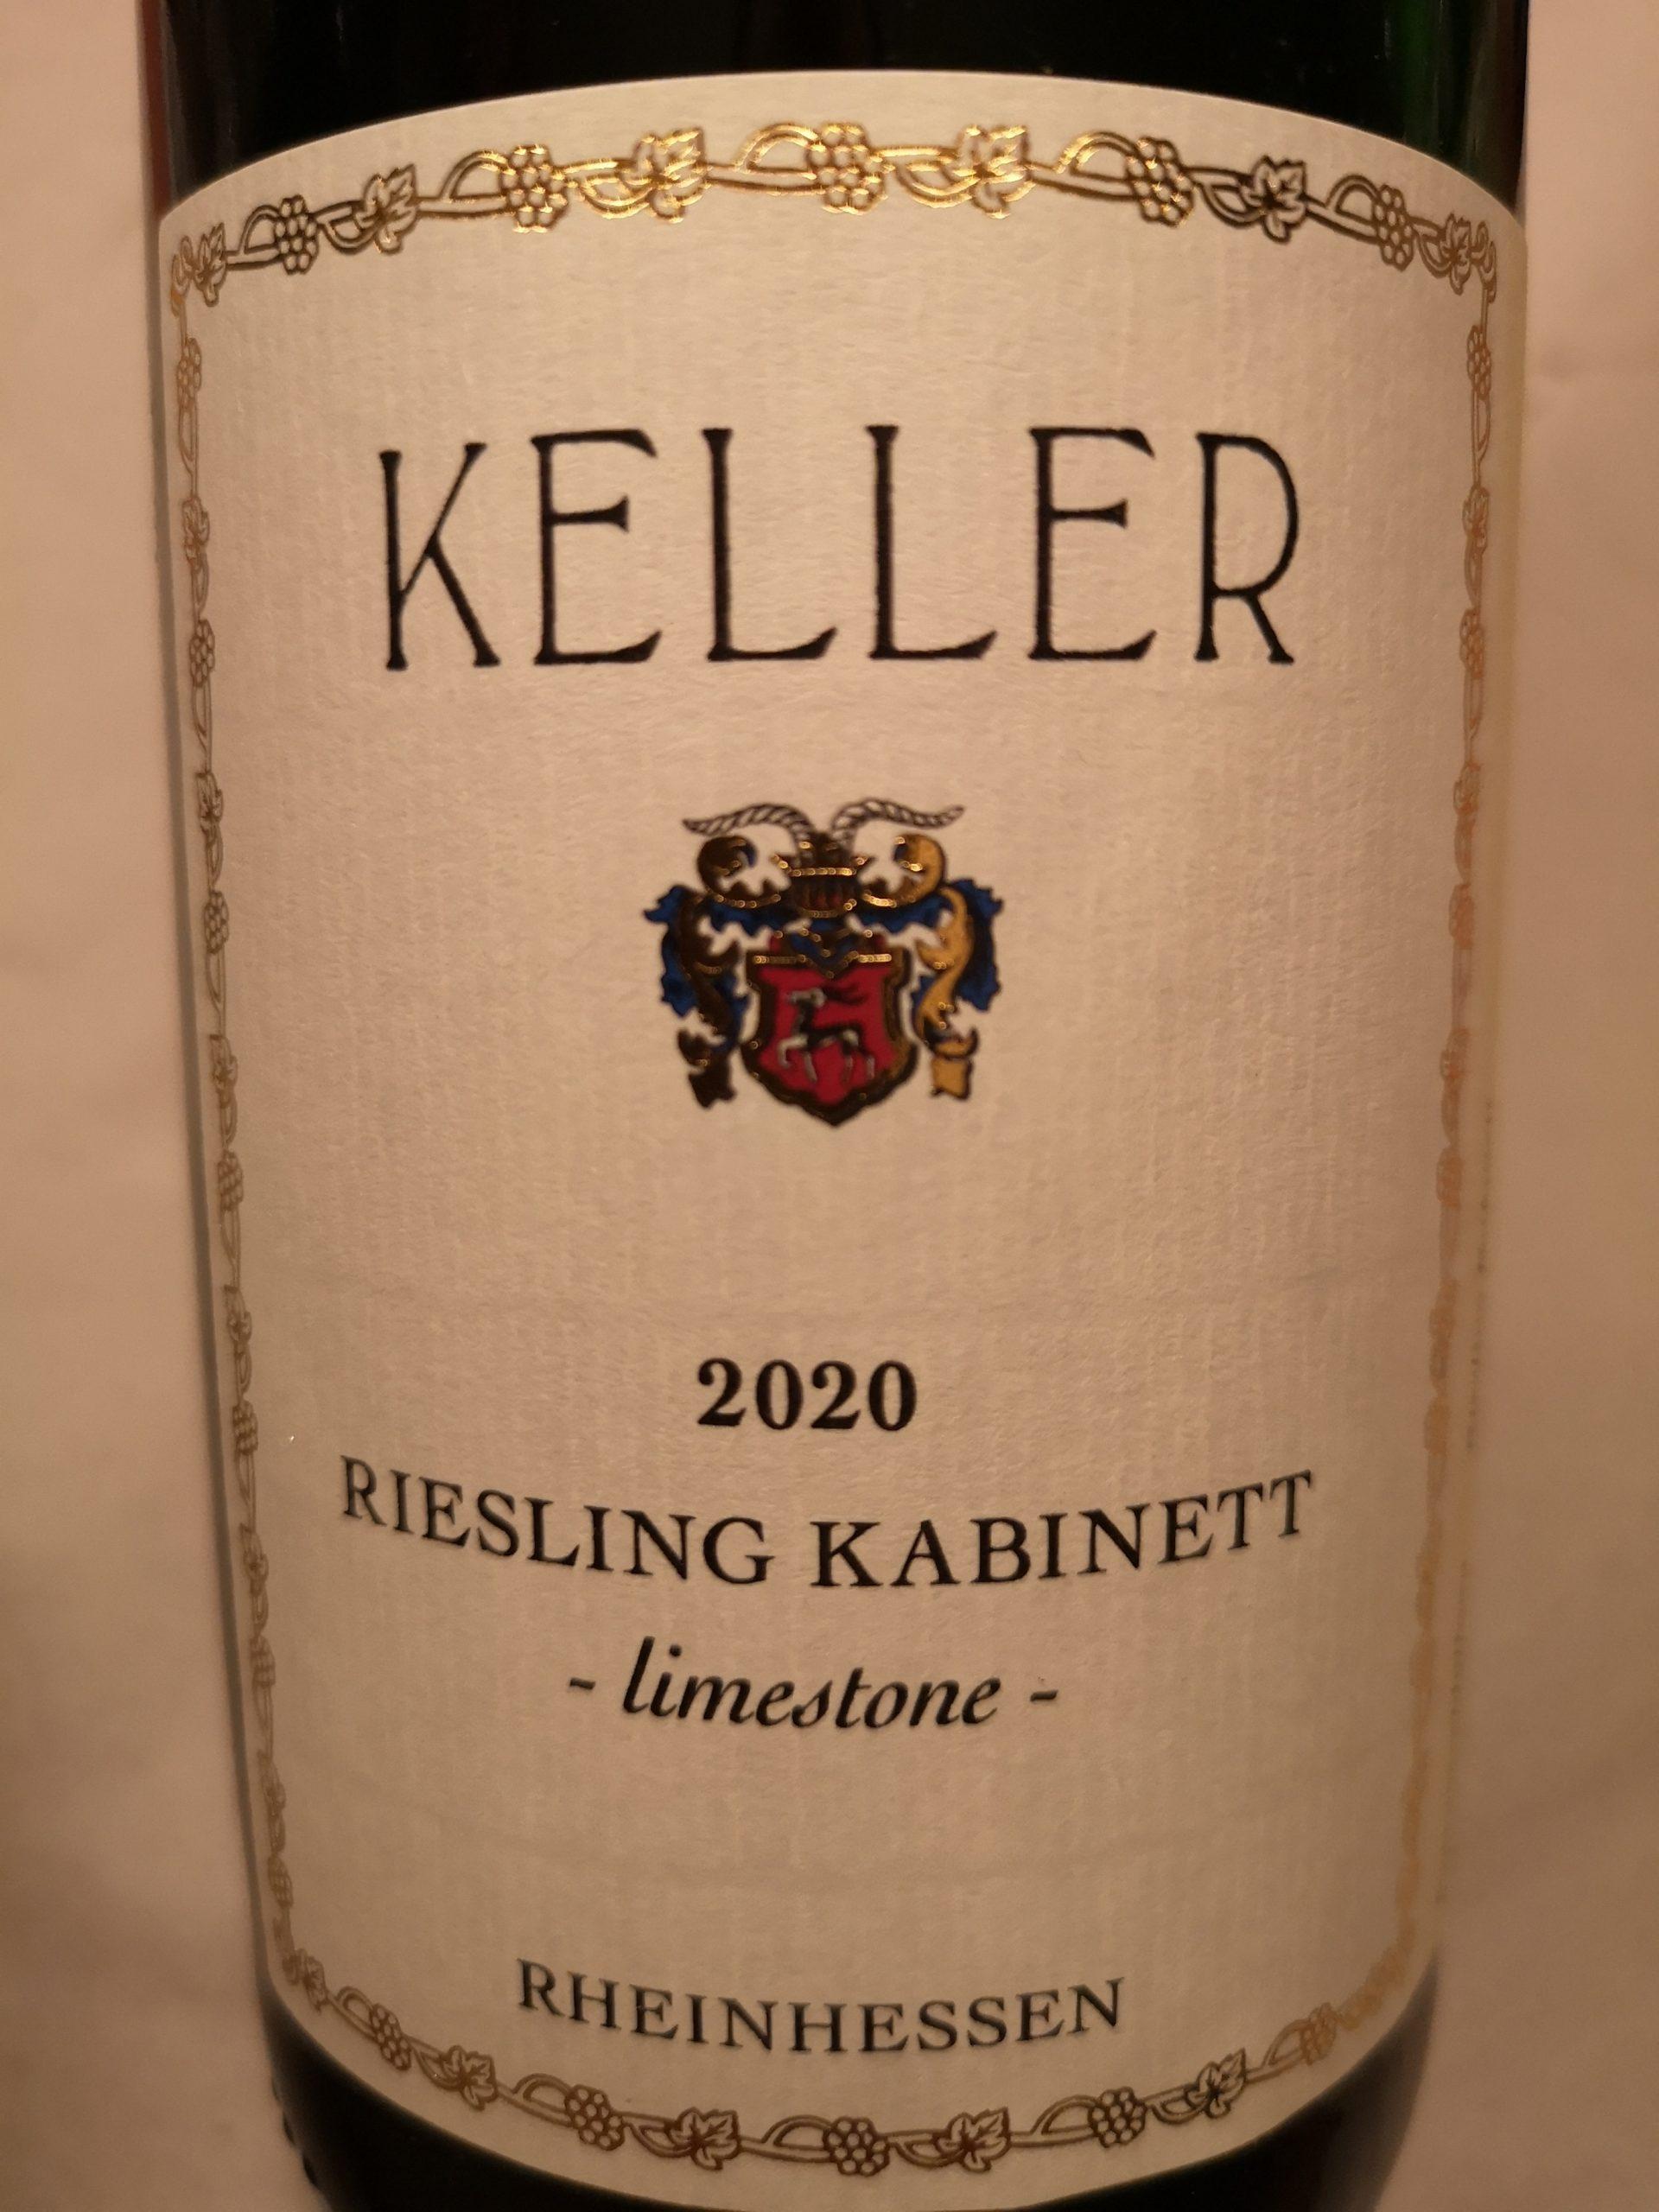 2020 Riesling Kabinett limestone | Keller